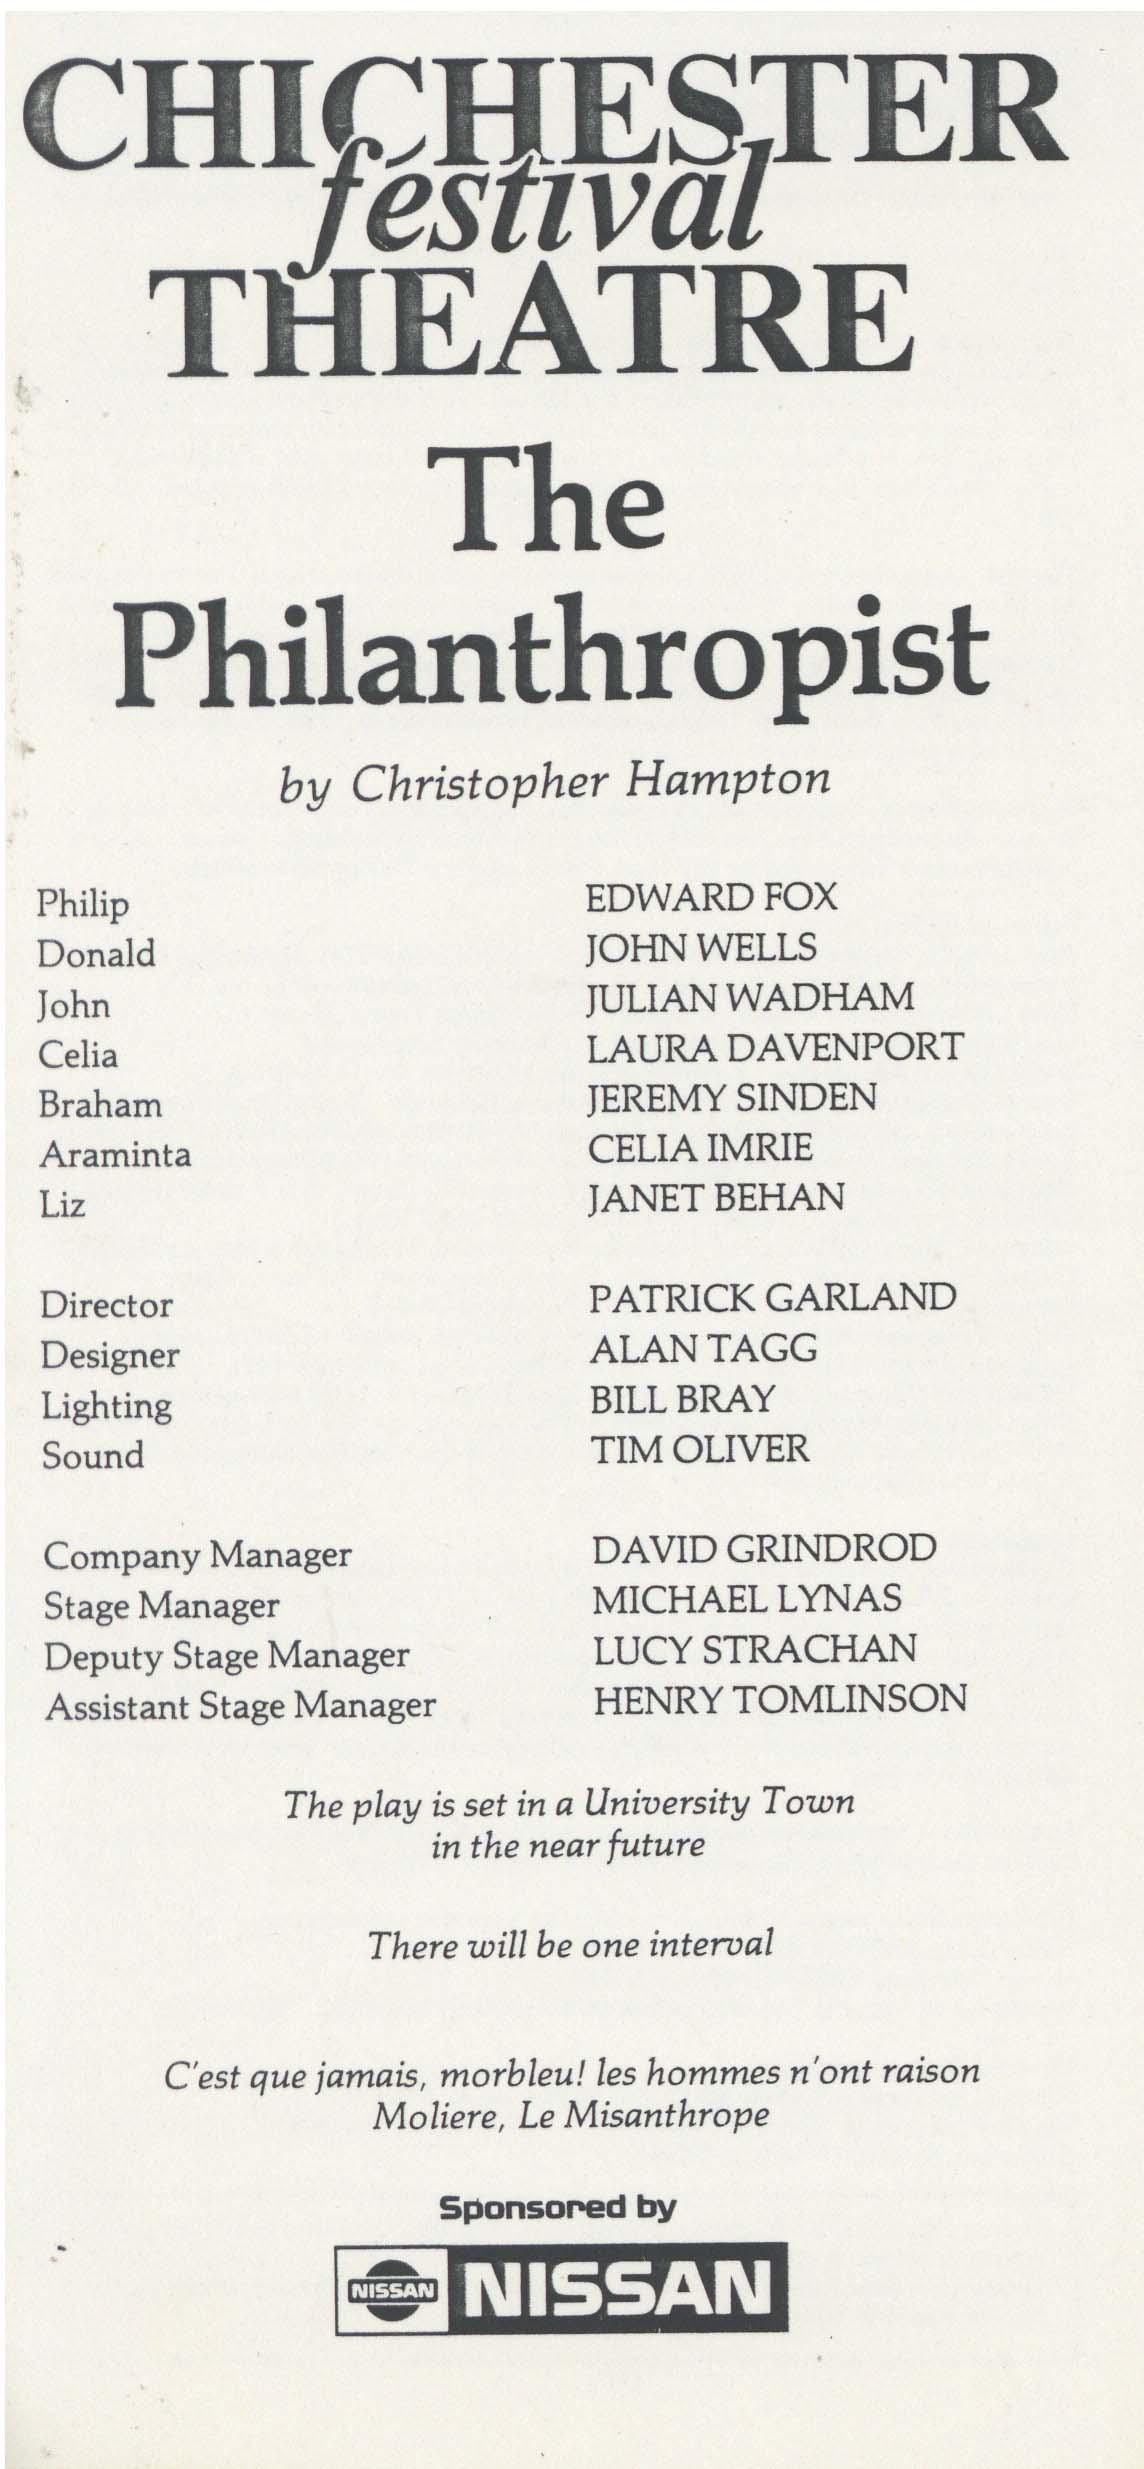 Cast List - The Philanthropist - 1985 - 1 of 2